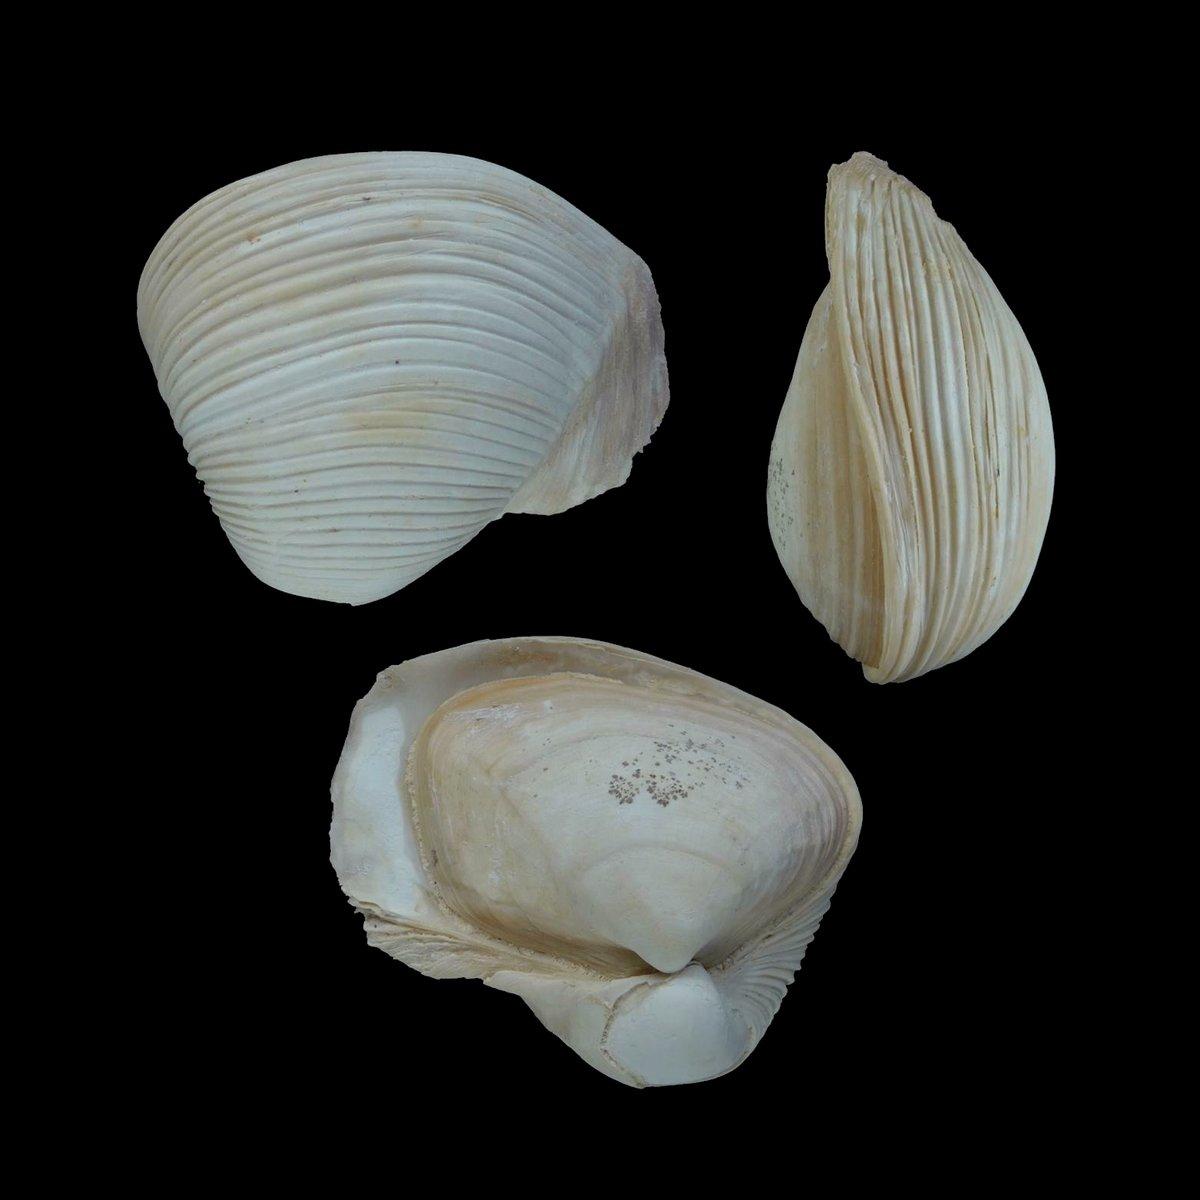 Bicorbula altavillensis